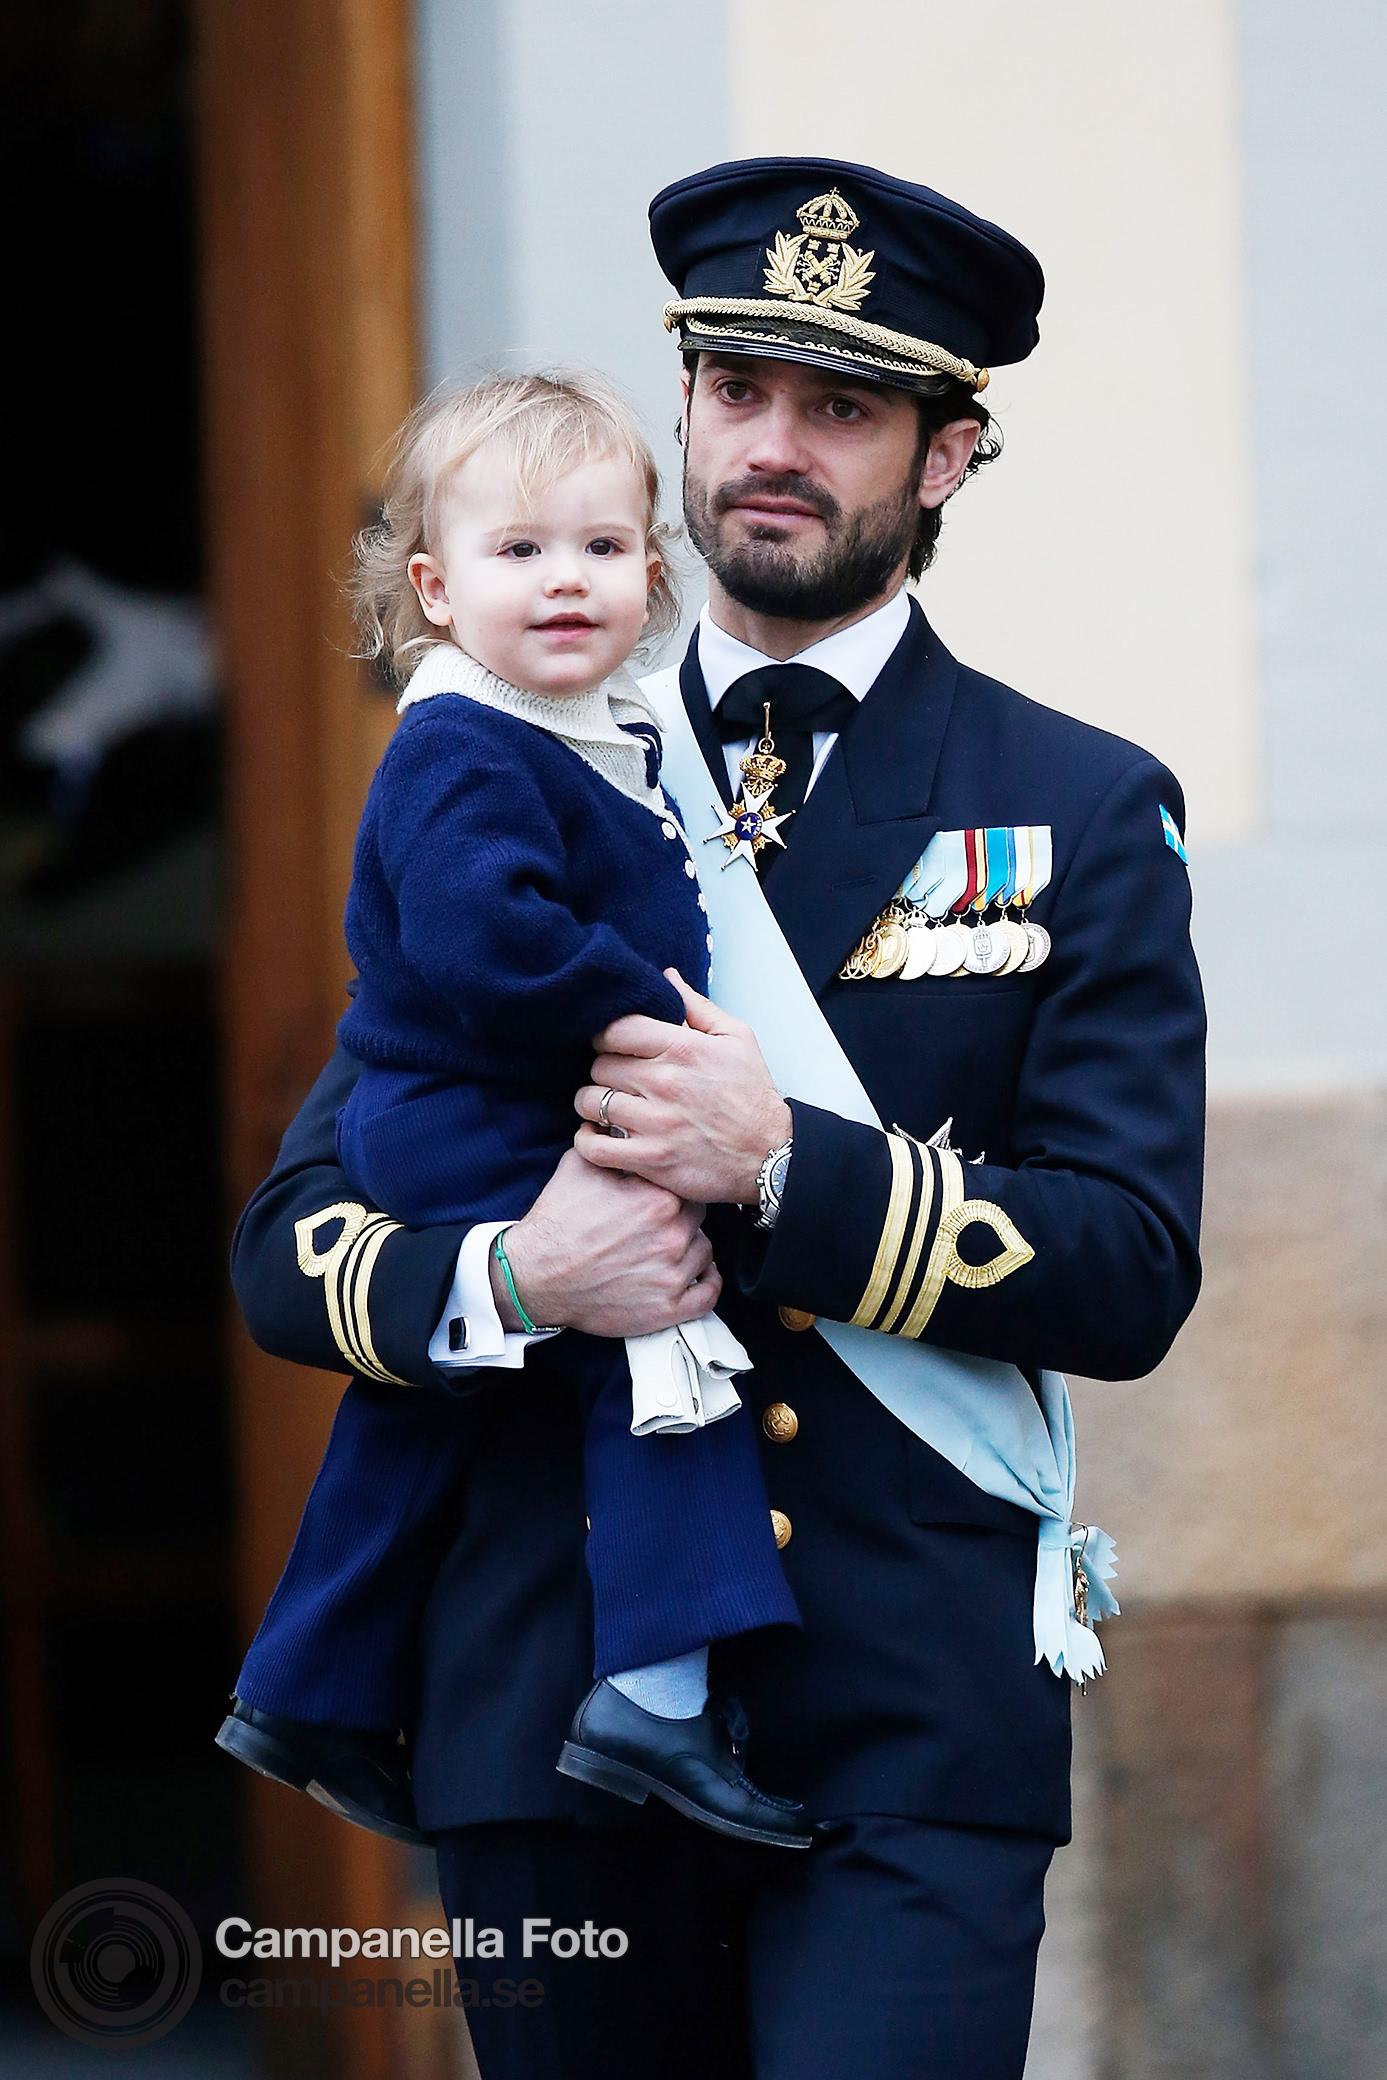 Prince Gabriel of Sweden's Baptism - Michael Campanella Photography